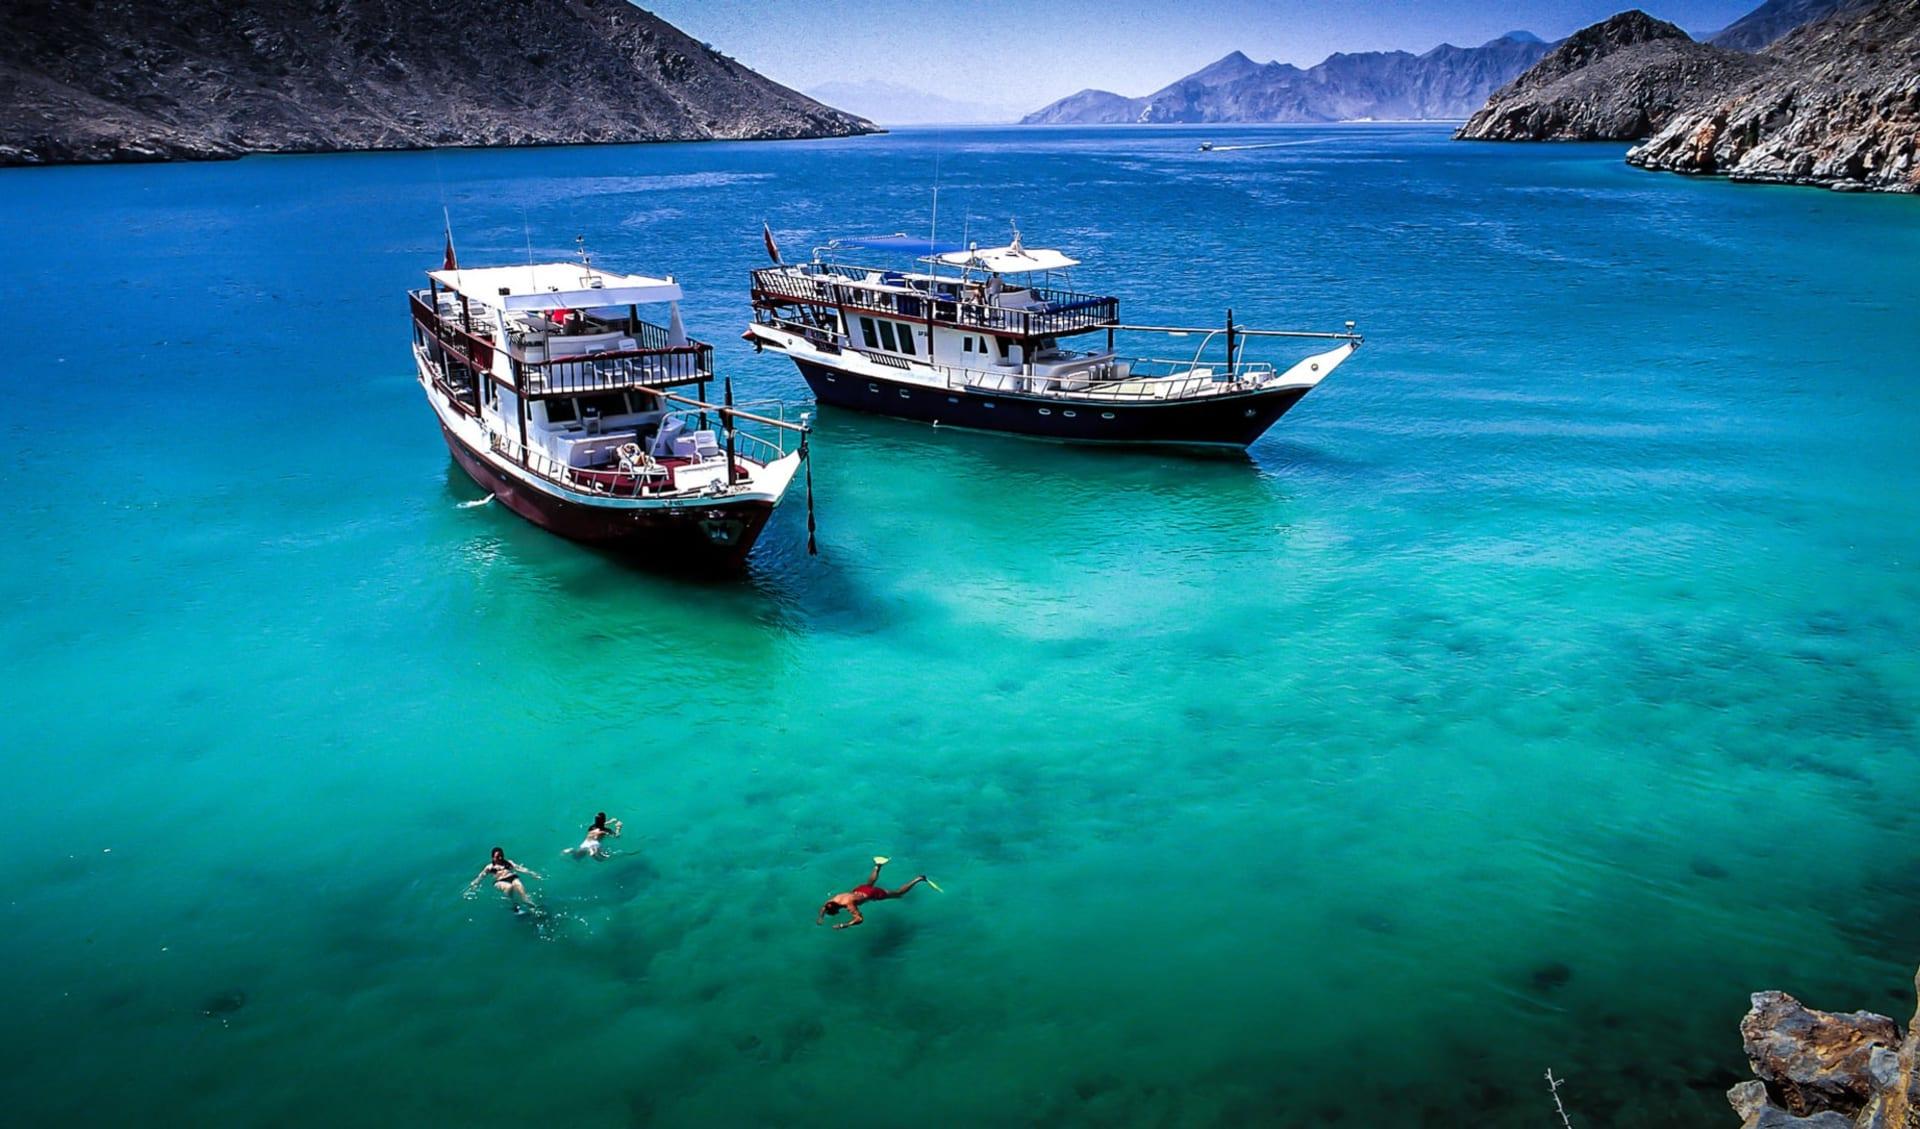 Omanische Exklave Musandam ab Muscat: Dhow Cruise Musandam - Oman